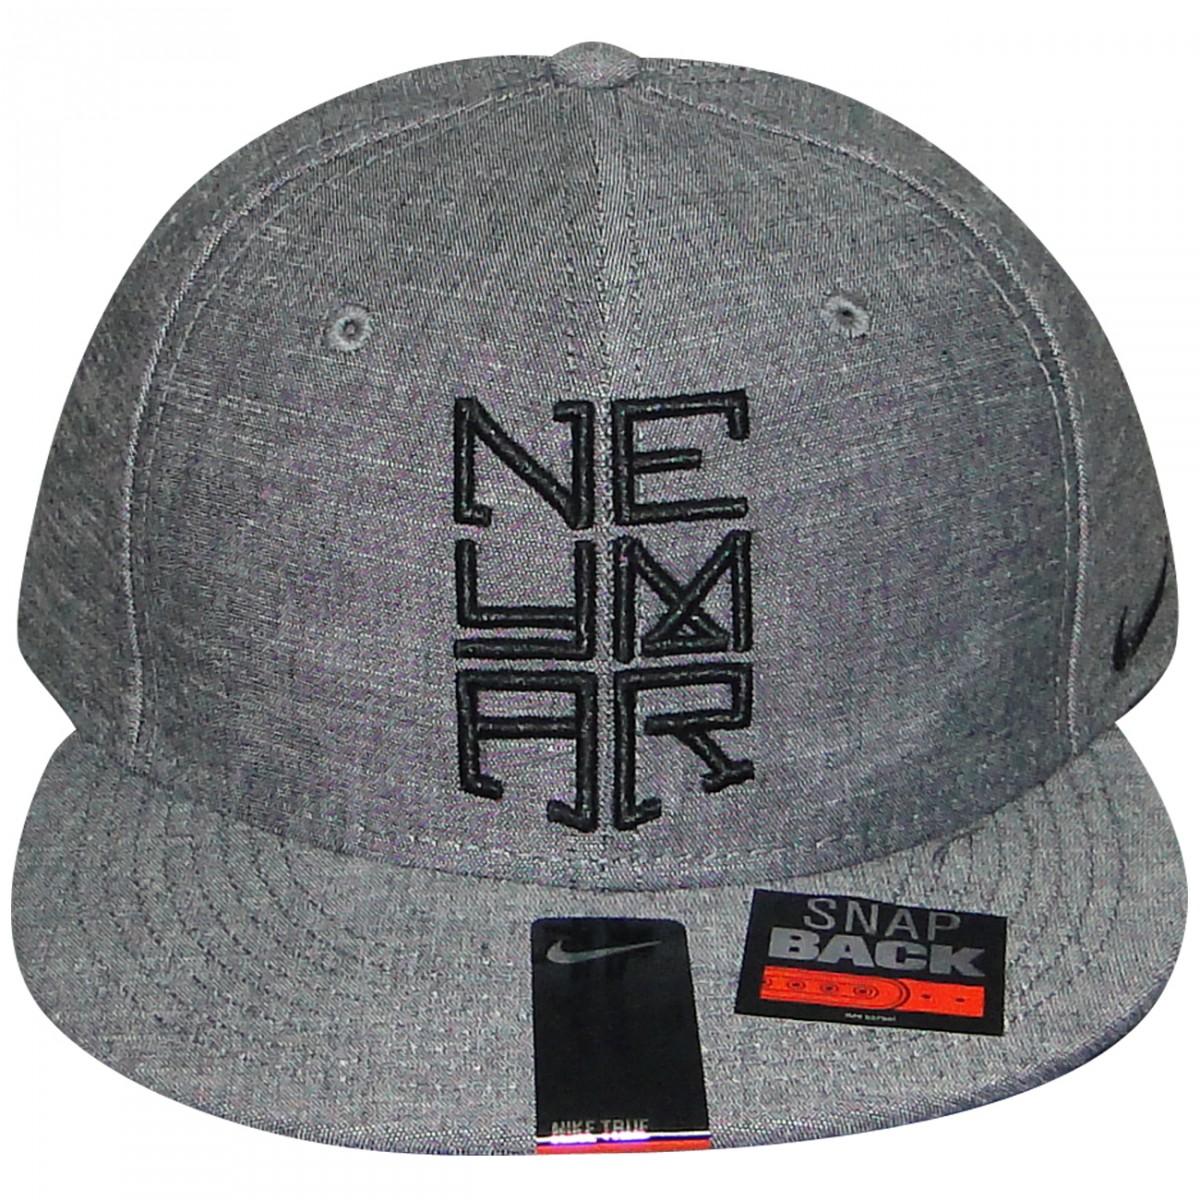 Bone Nike Neymar 612660 612660 032 - Grafite Preto - Chuteira Nike ... c1d29cafd39